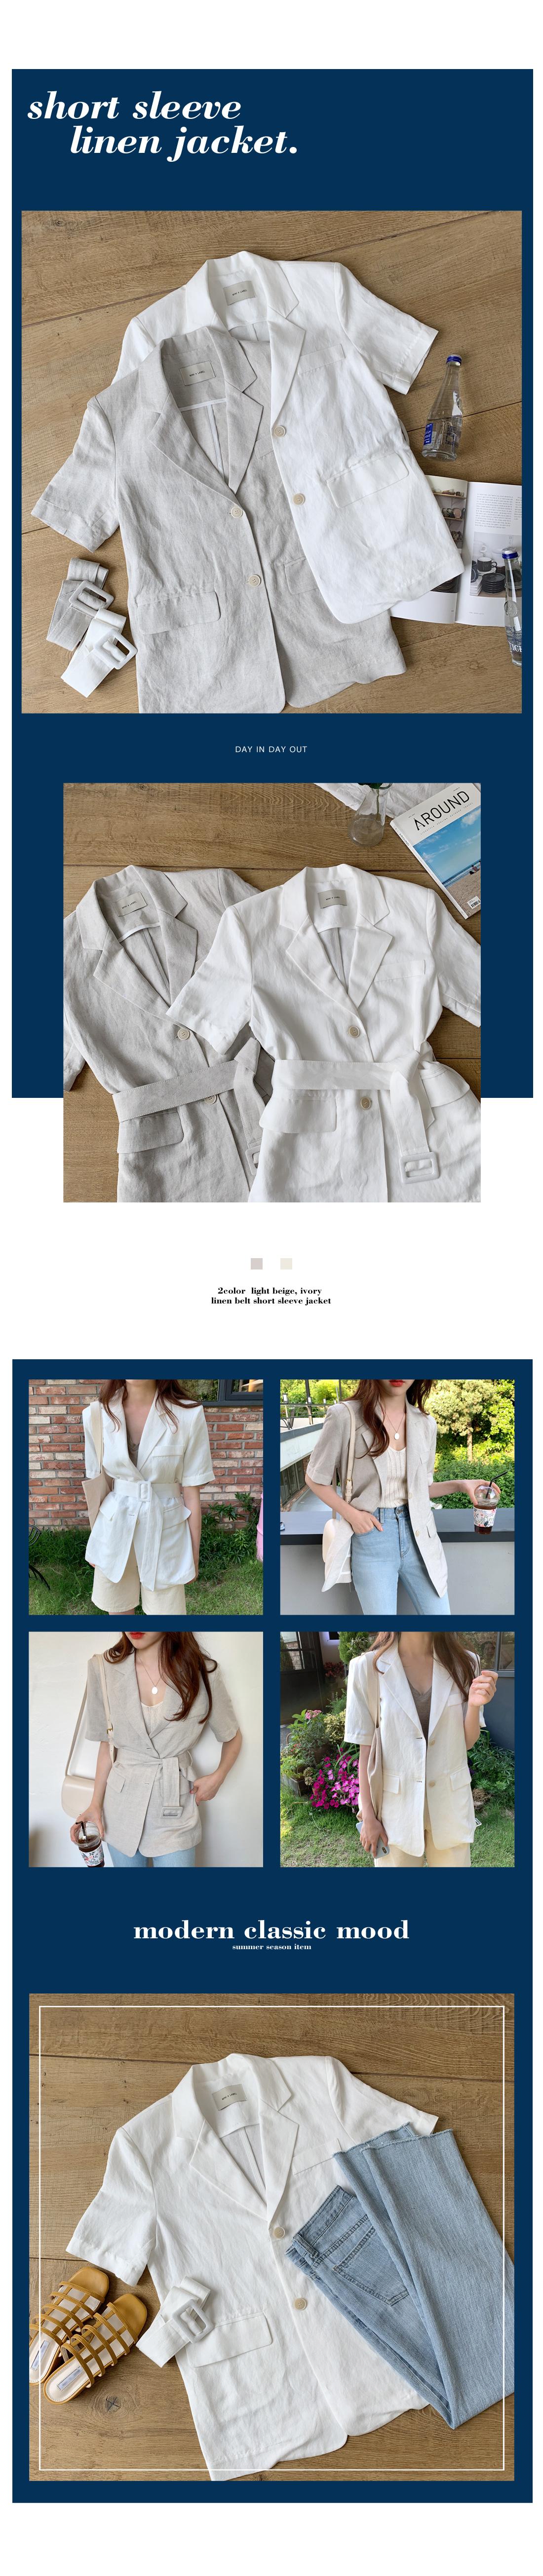 Mono Belt Linen Short Sleeve Jacket